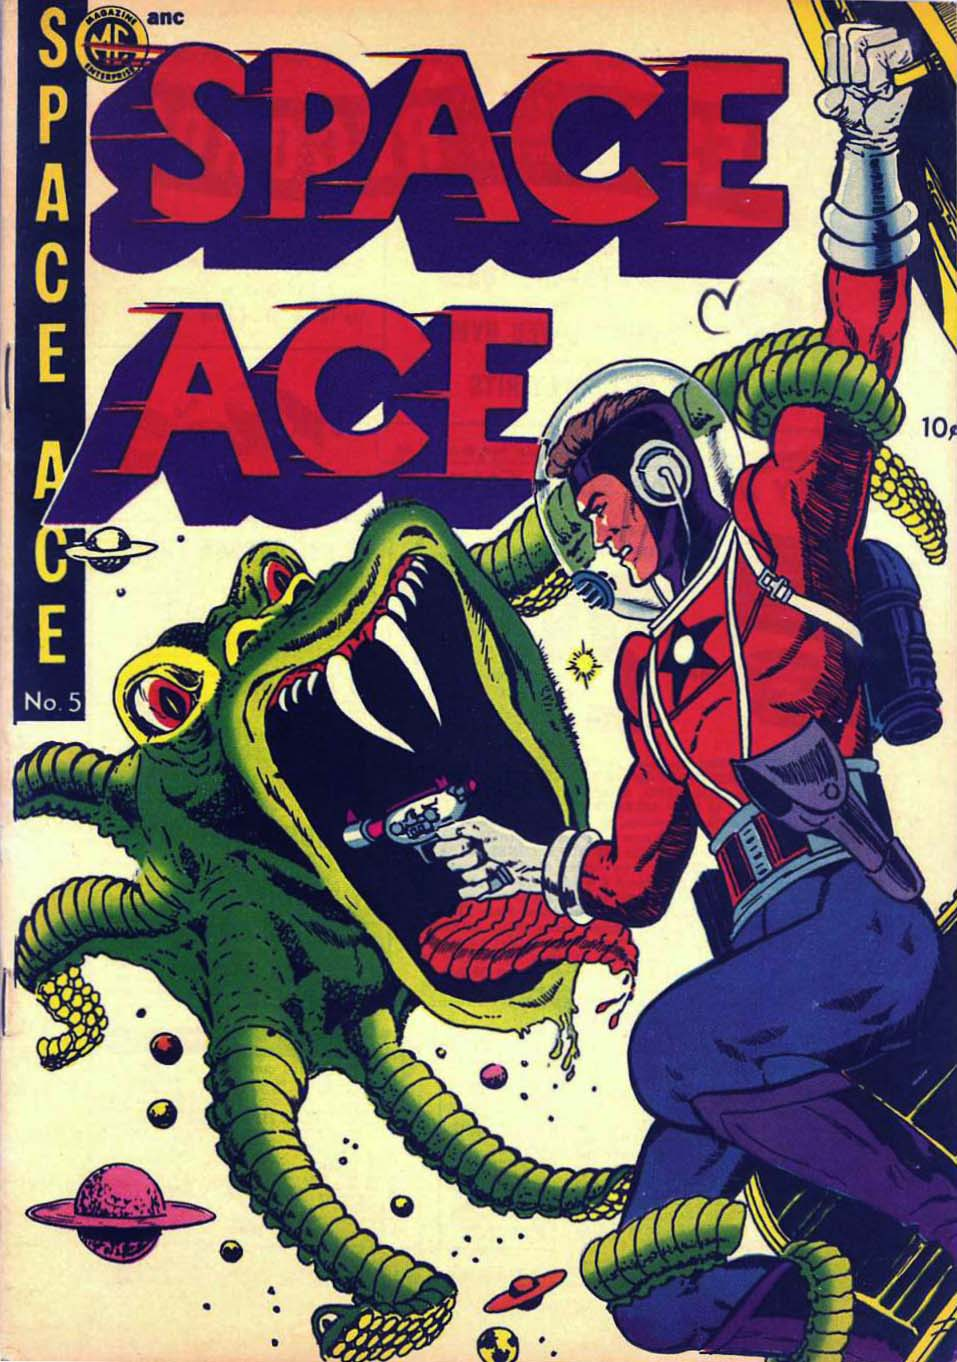 SpaceAce5